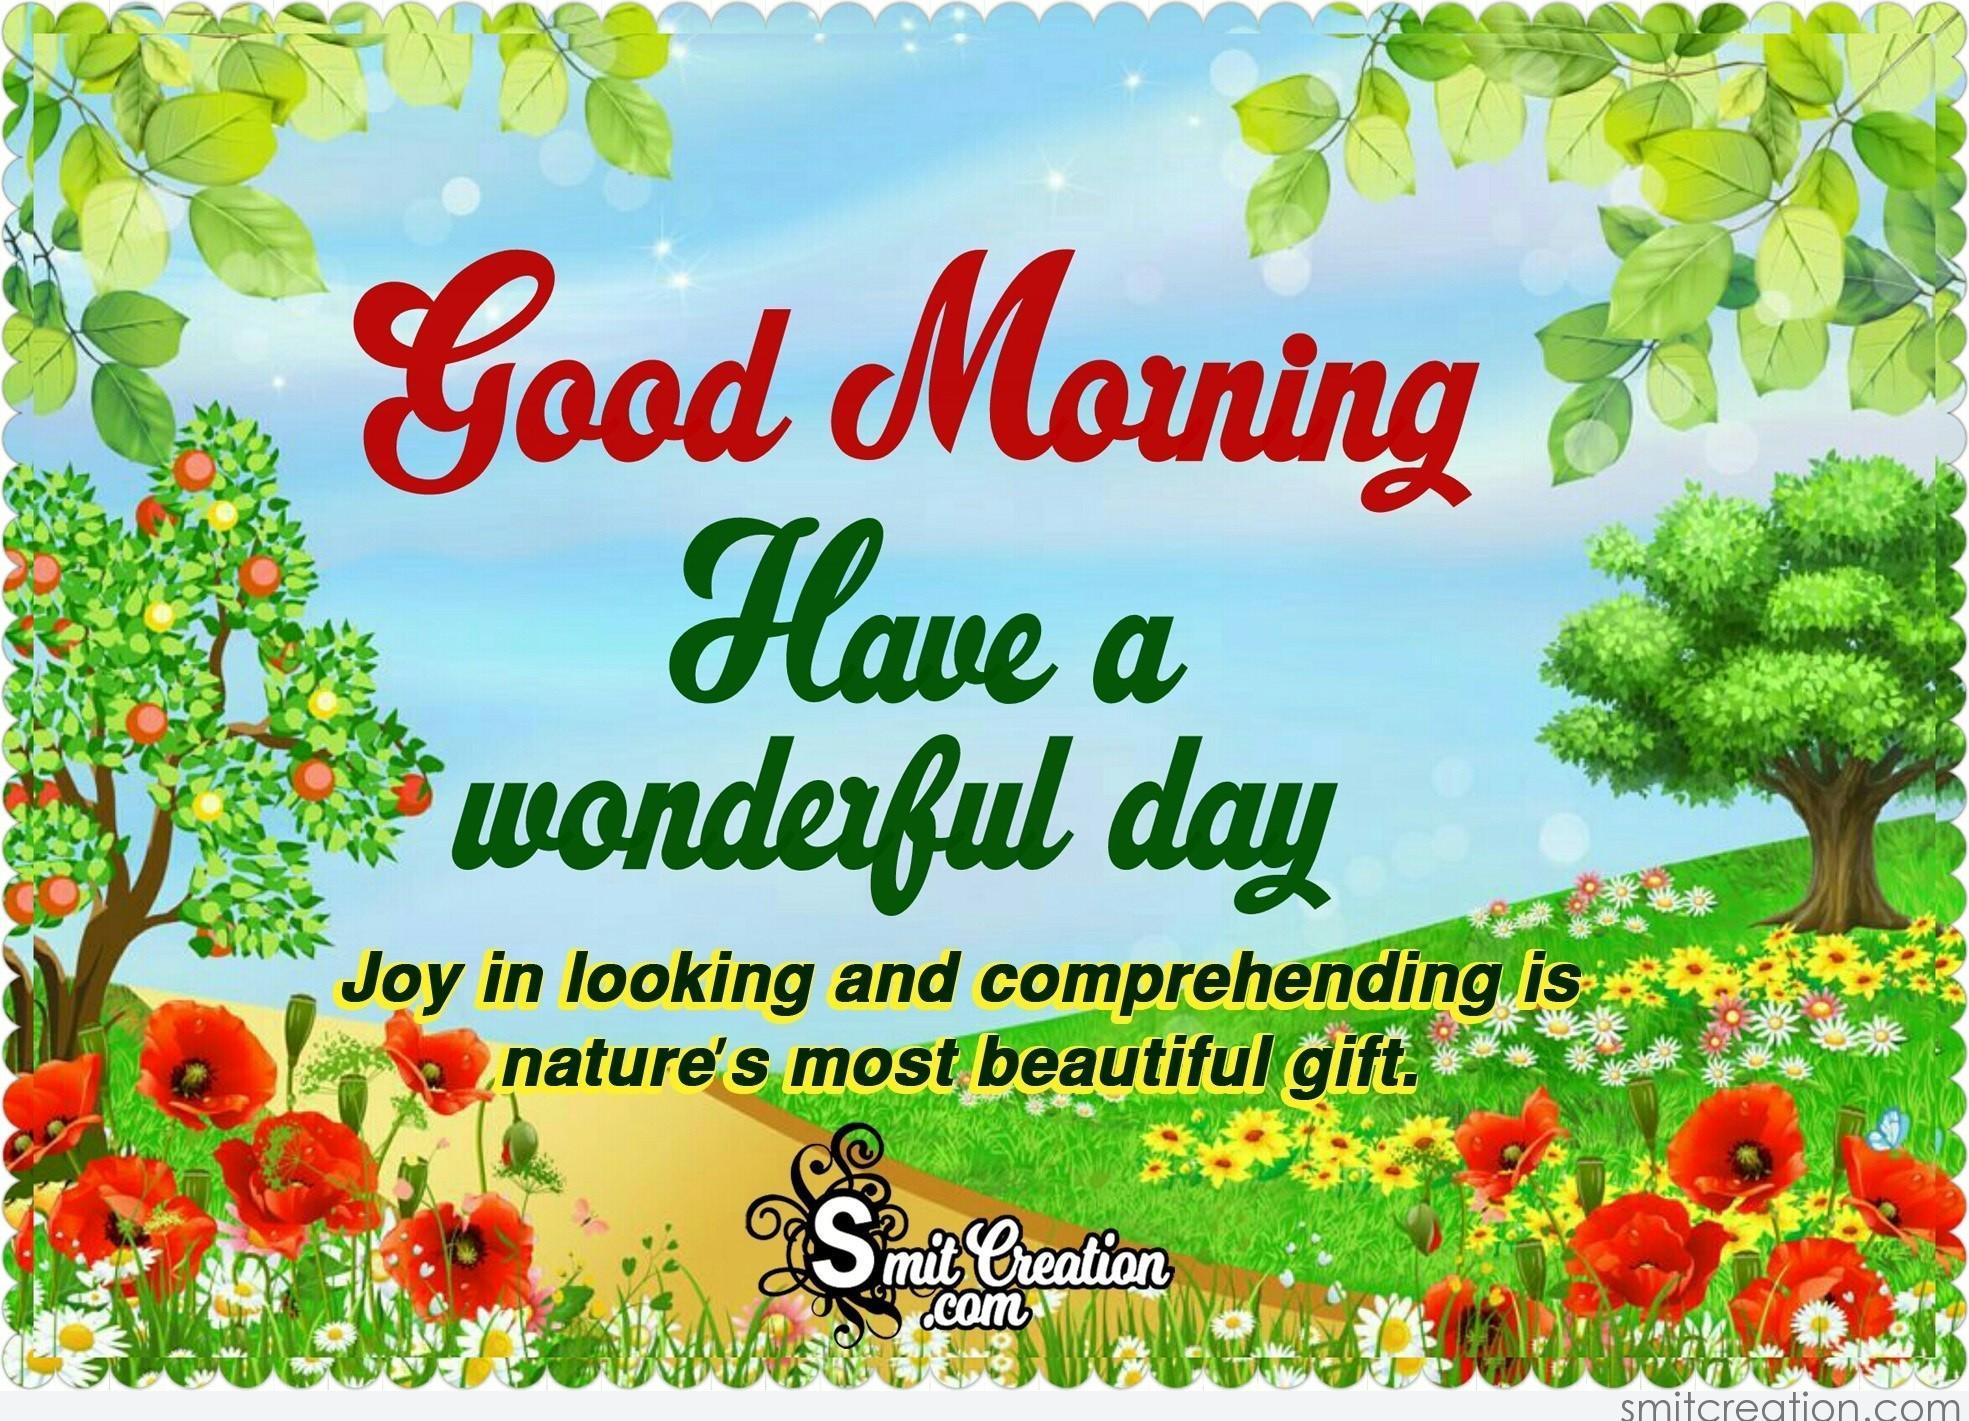 Good Morning Nature Quotes Images Smitcreation Com